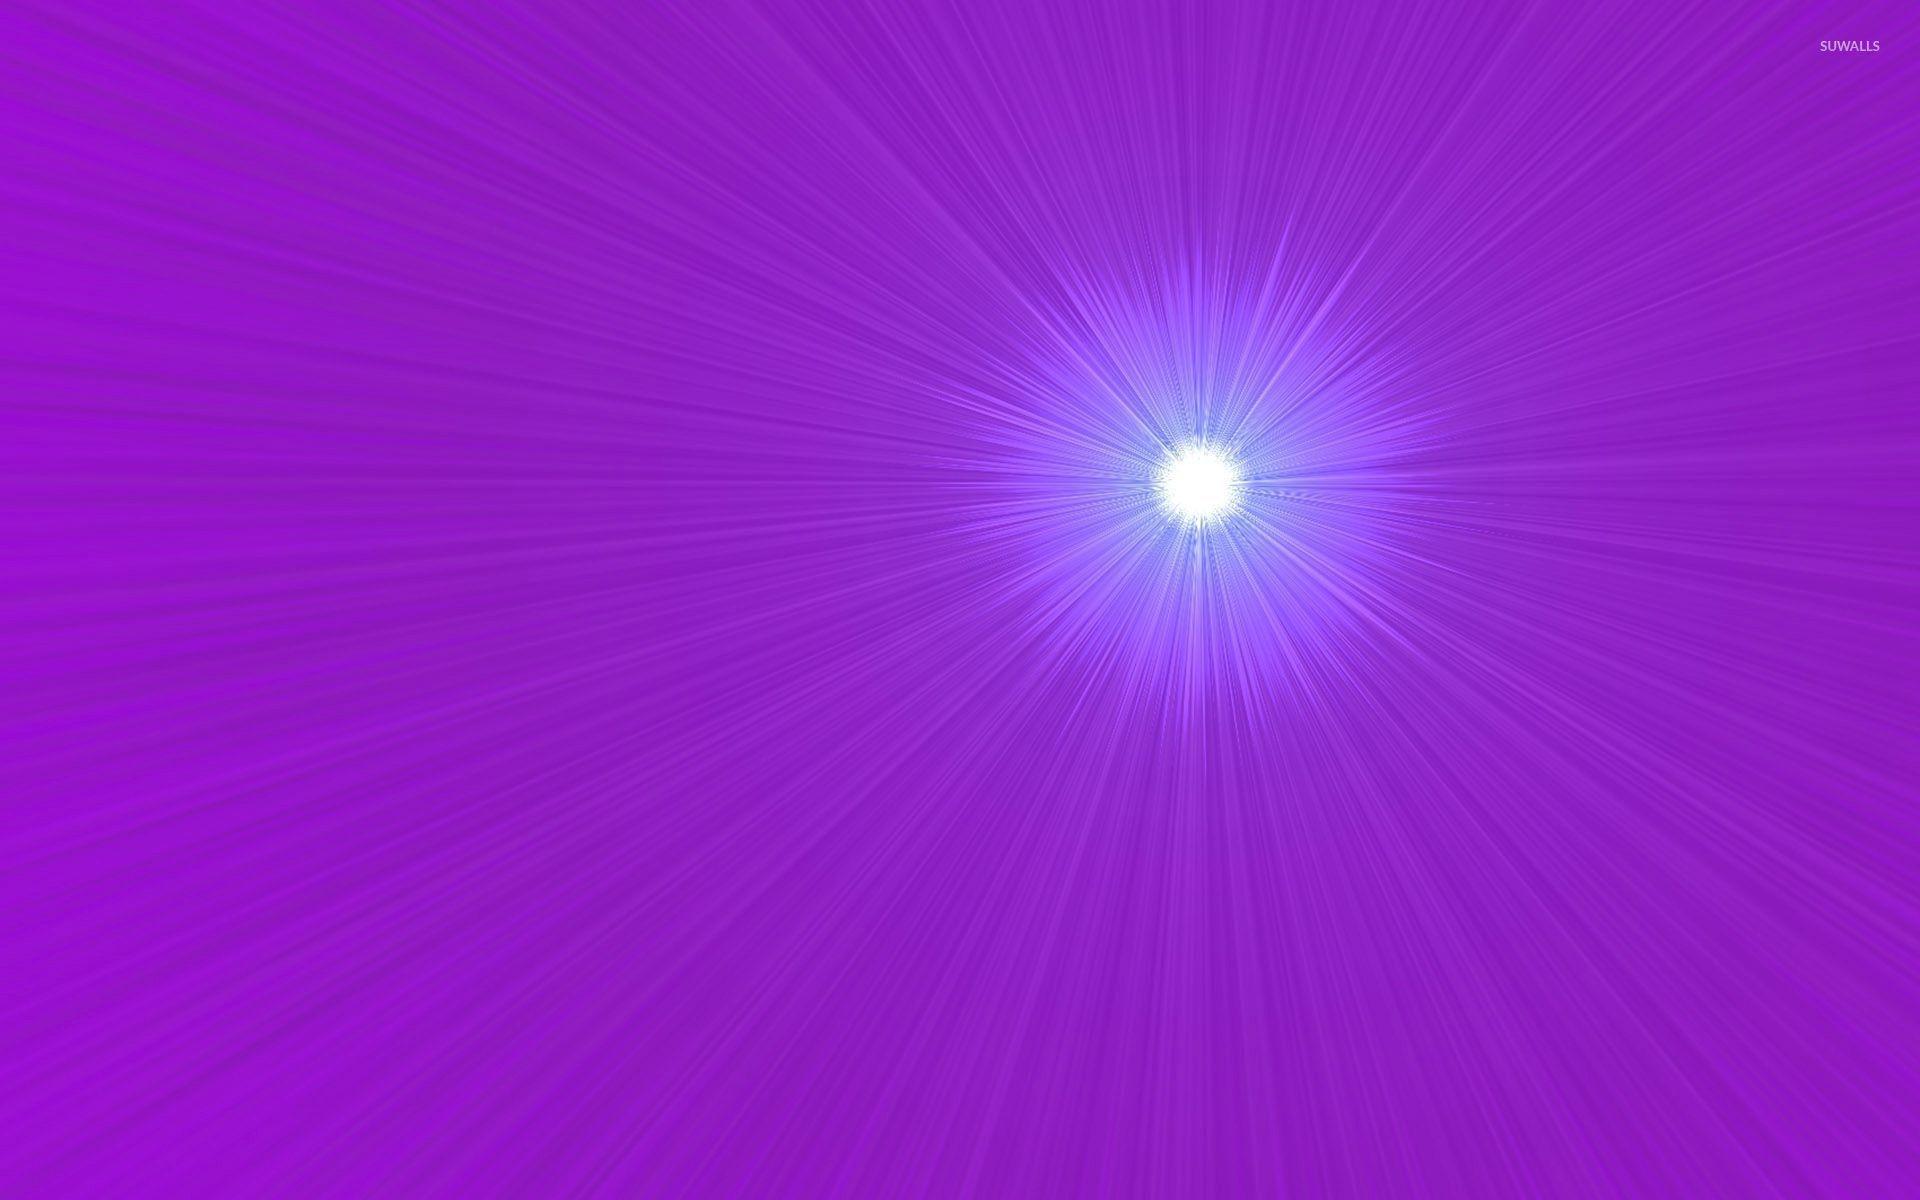 Bright light on the purple wall wallpaper jpg